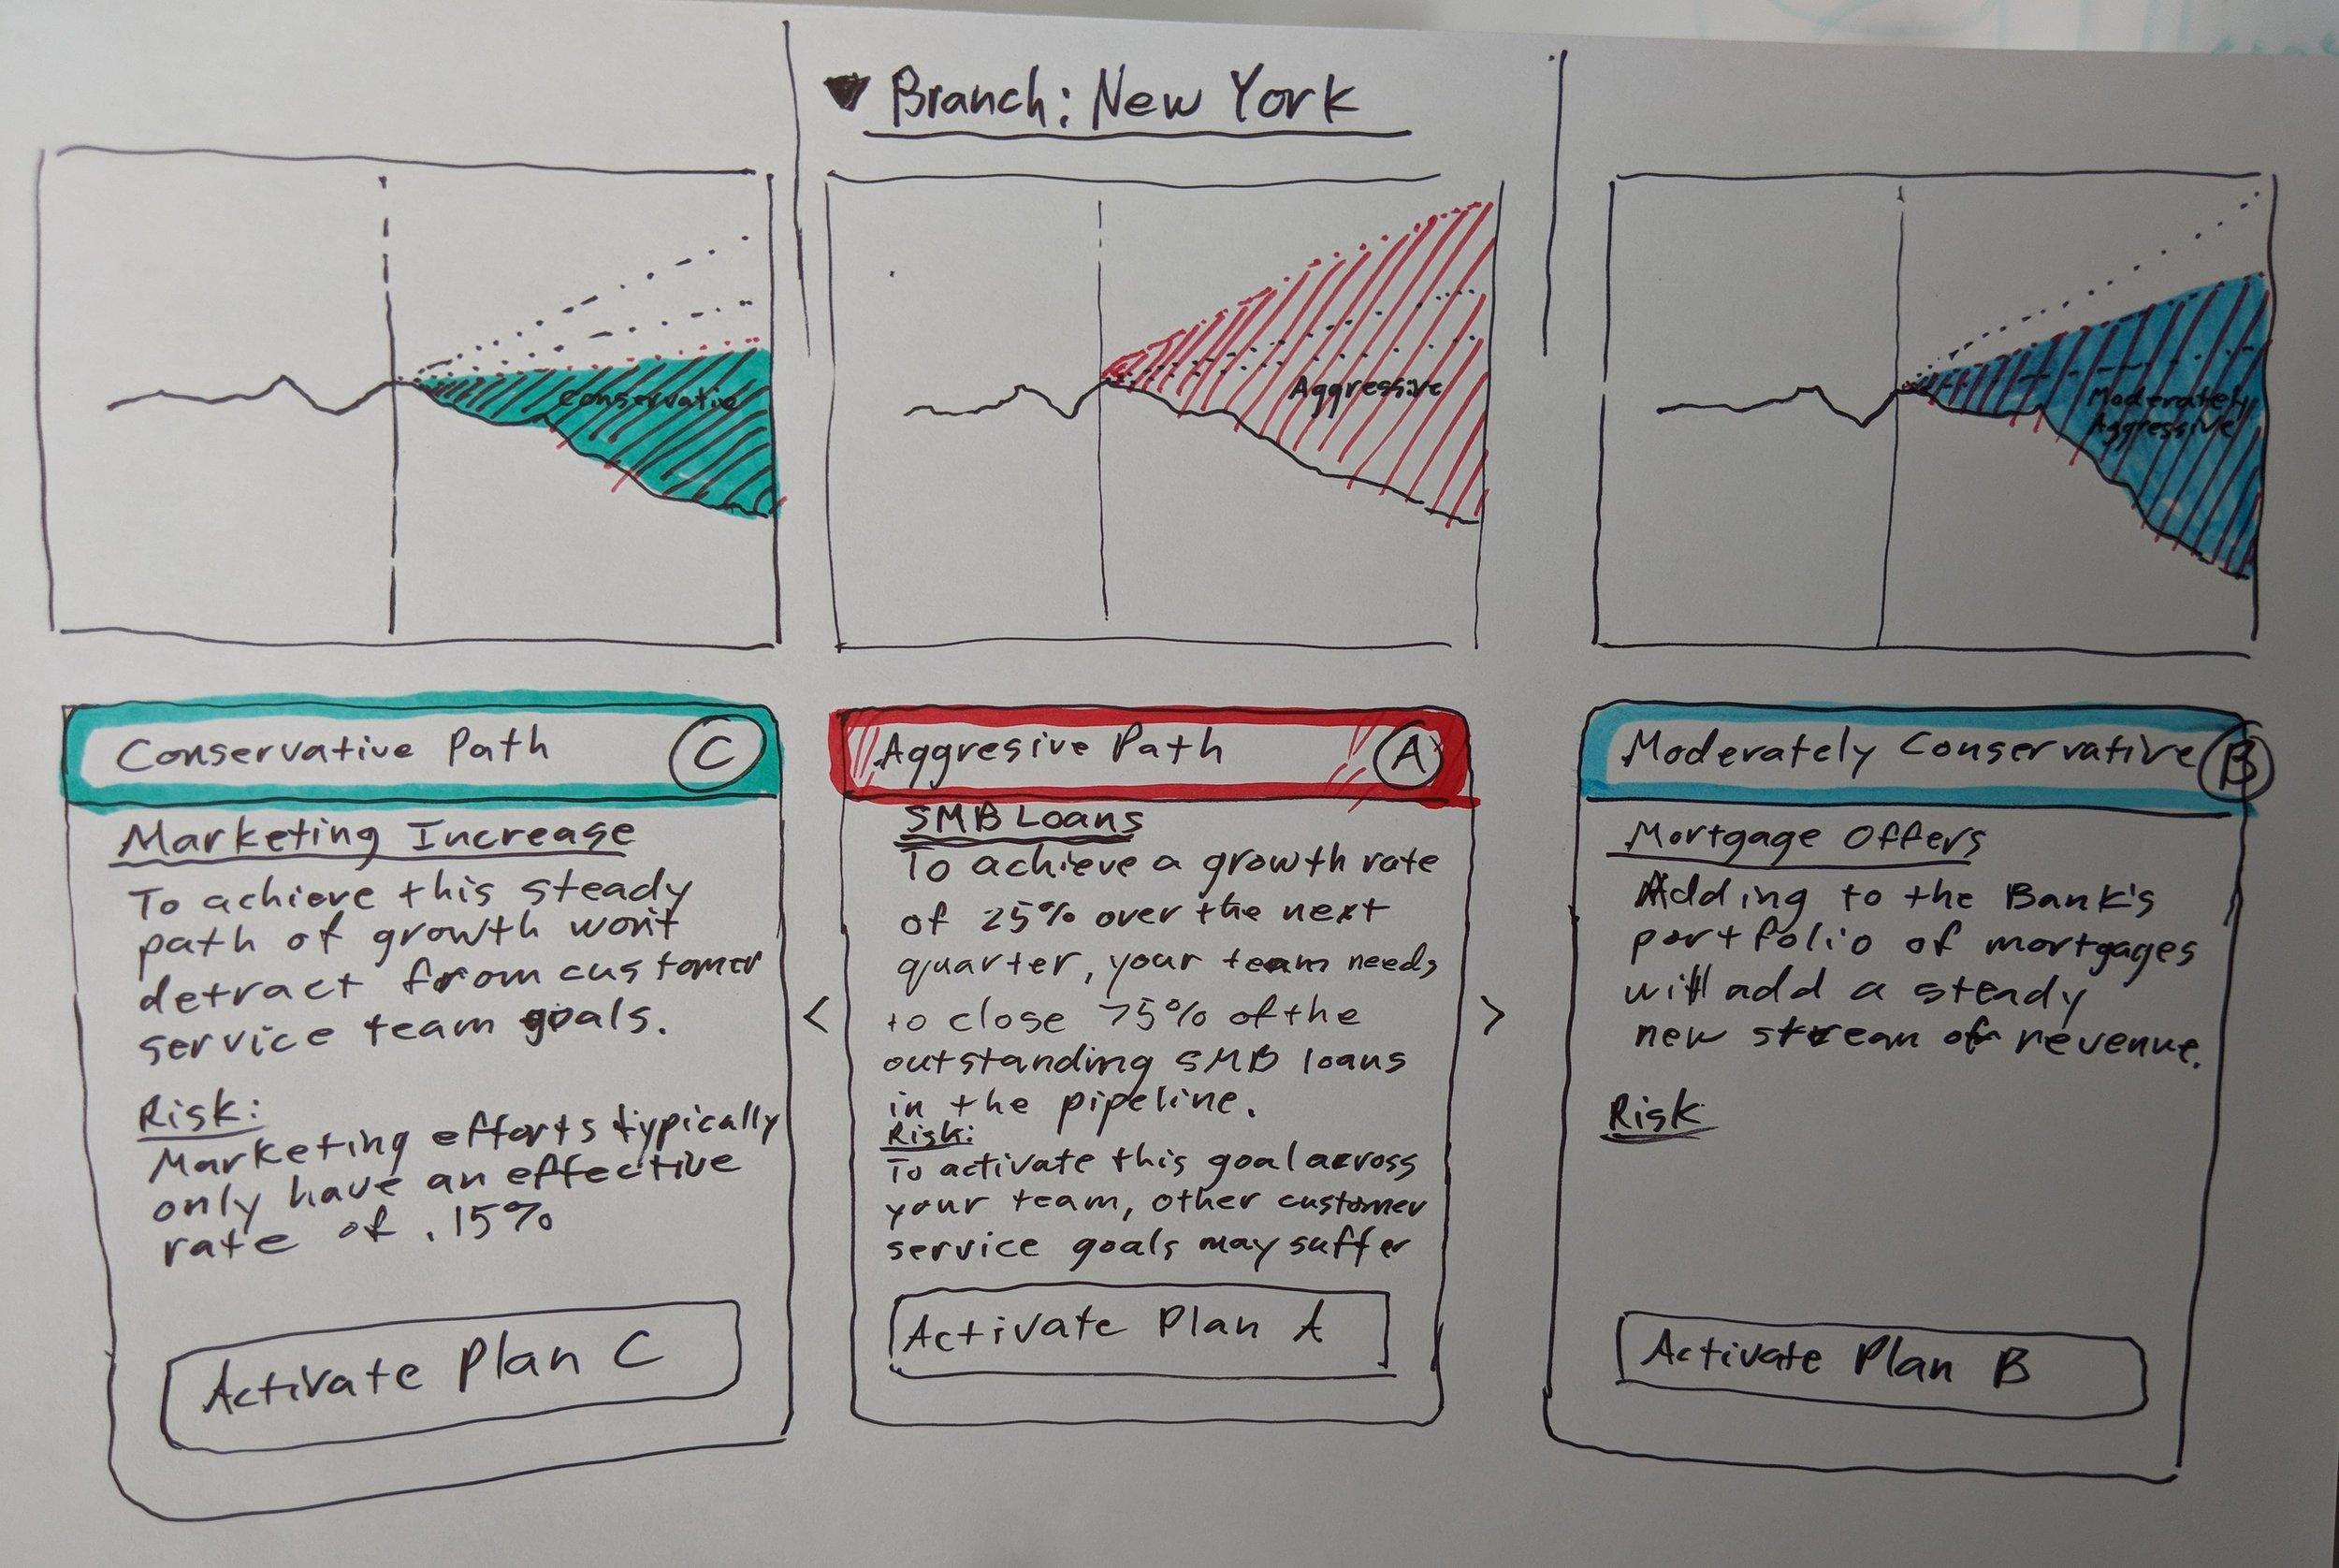 Whiteboard of risk based financial plans